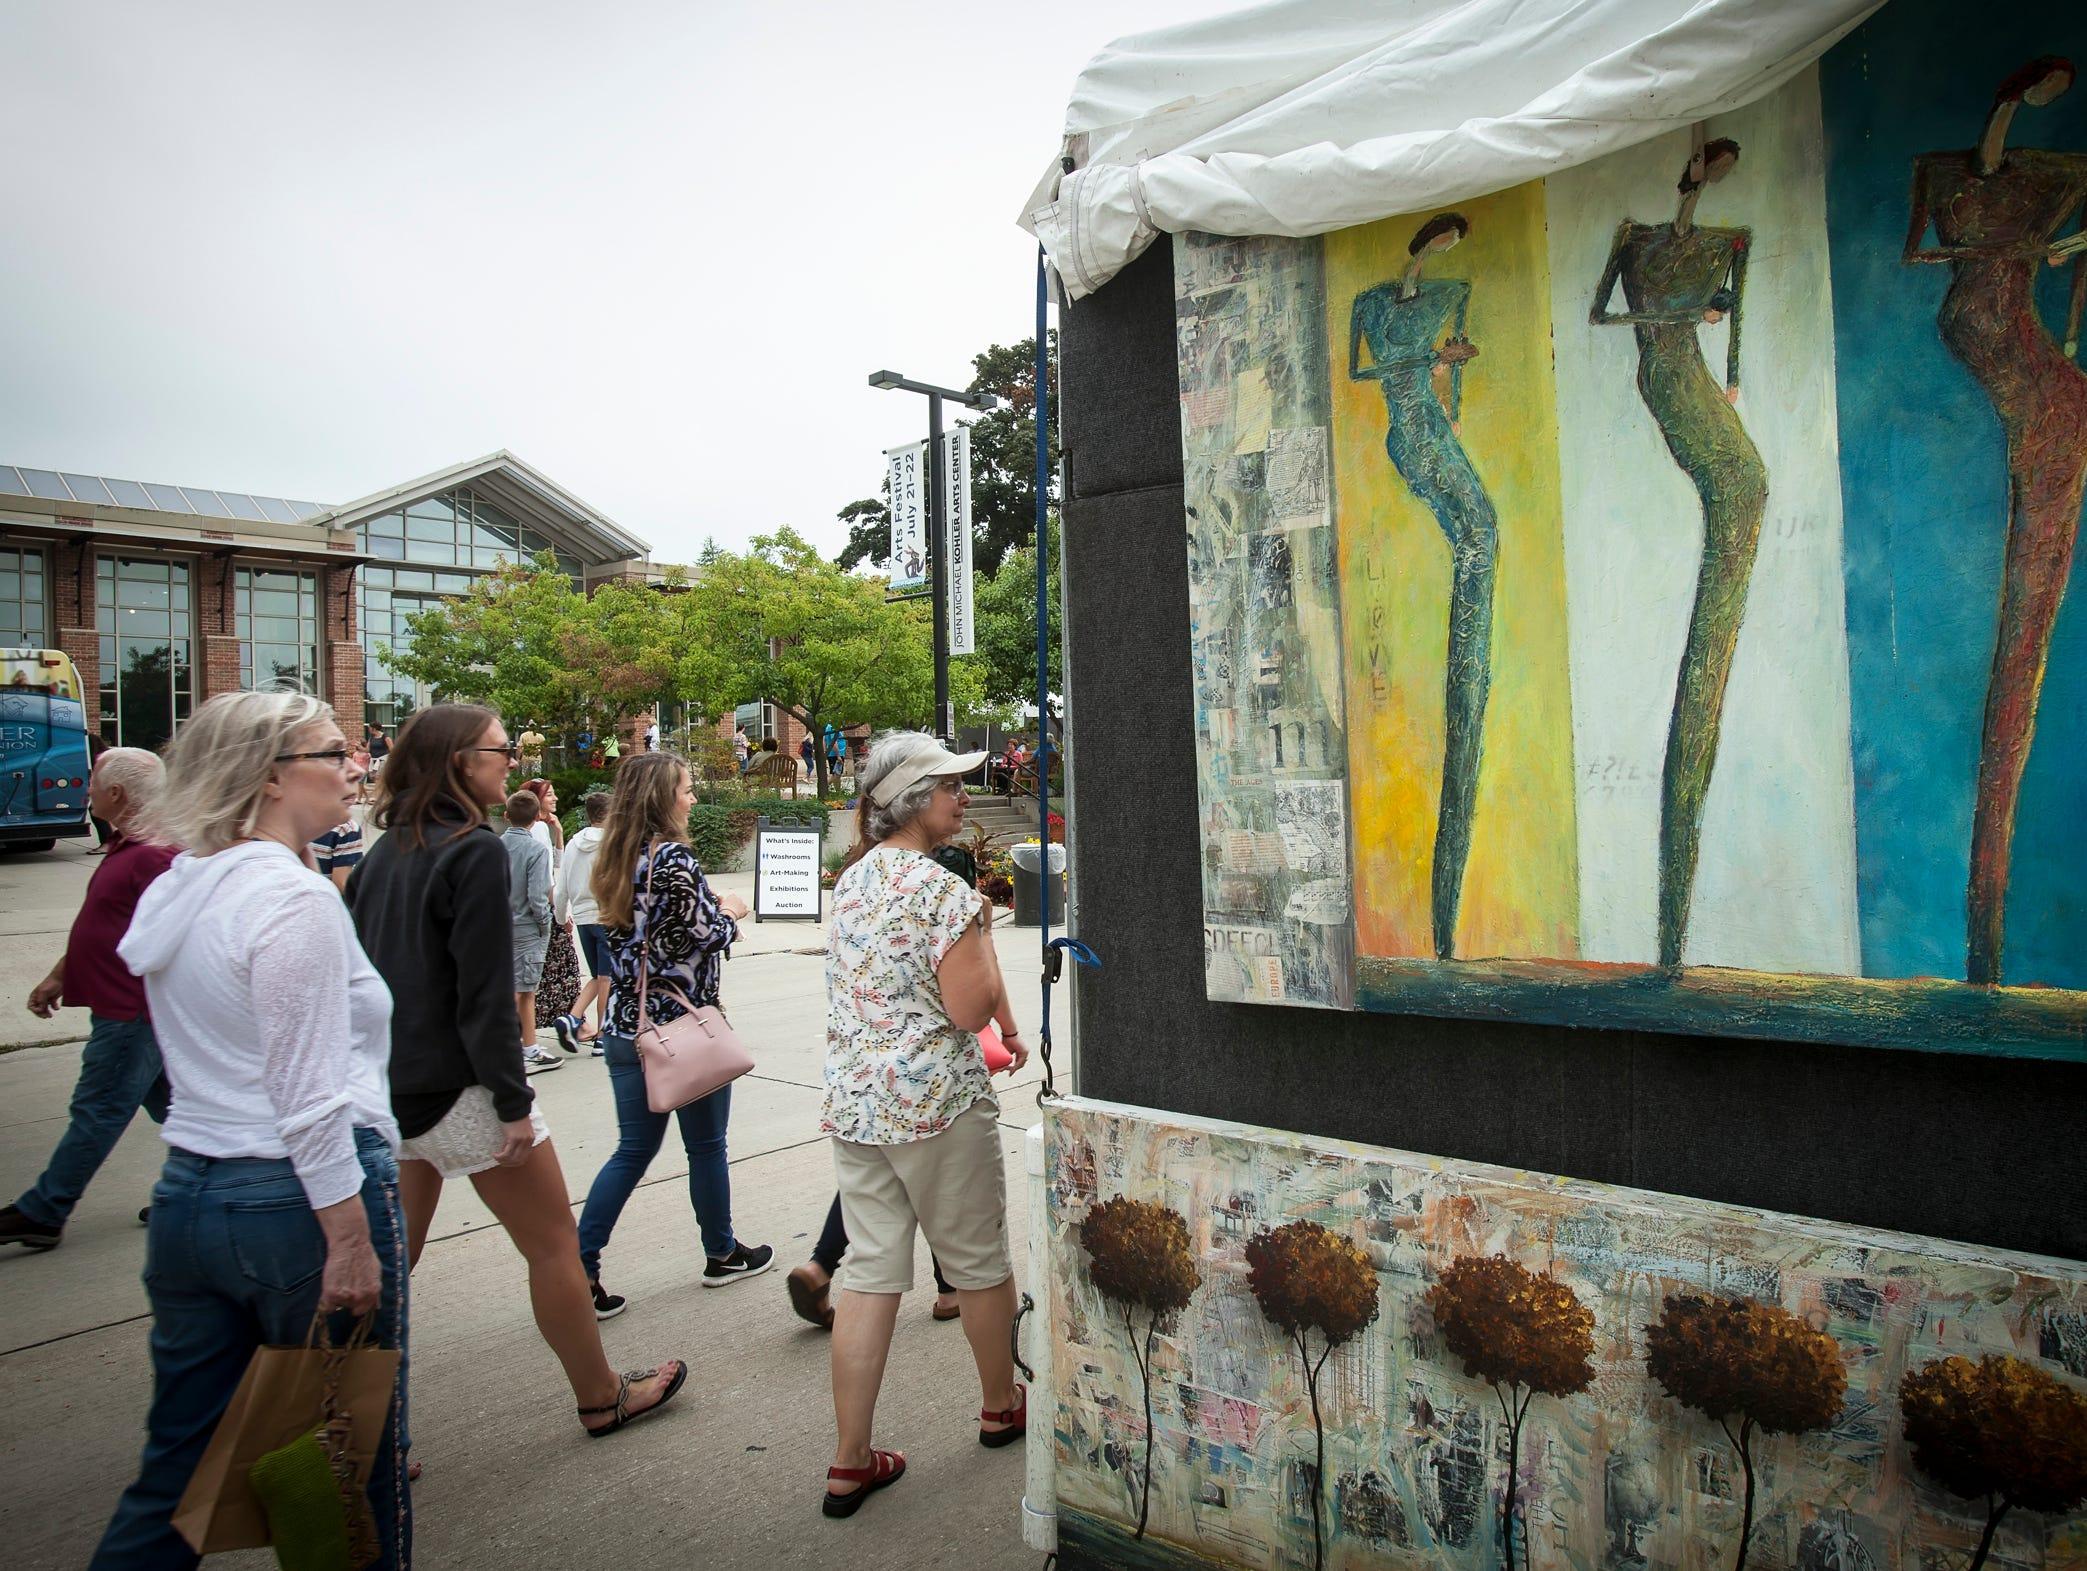 Scenes from the Midsummer Festival of the Arts outside the John Michael Kohler Arts Center in Sheboygan on July 21.